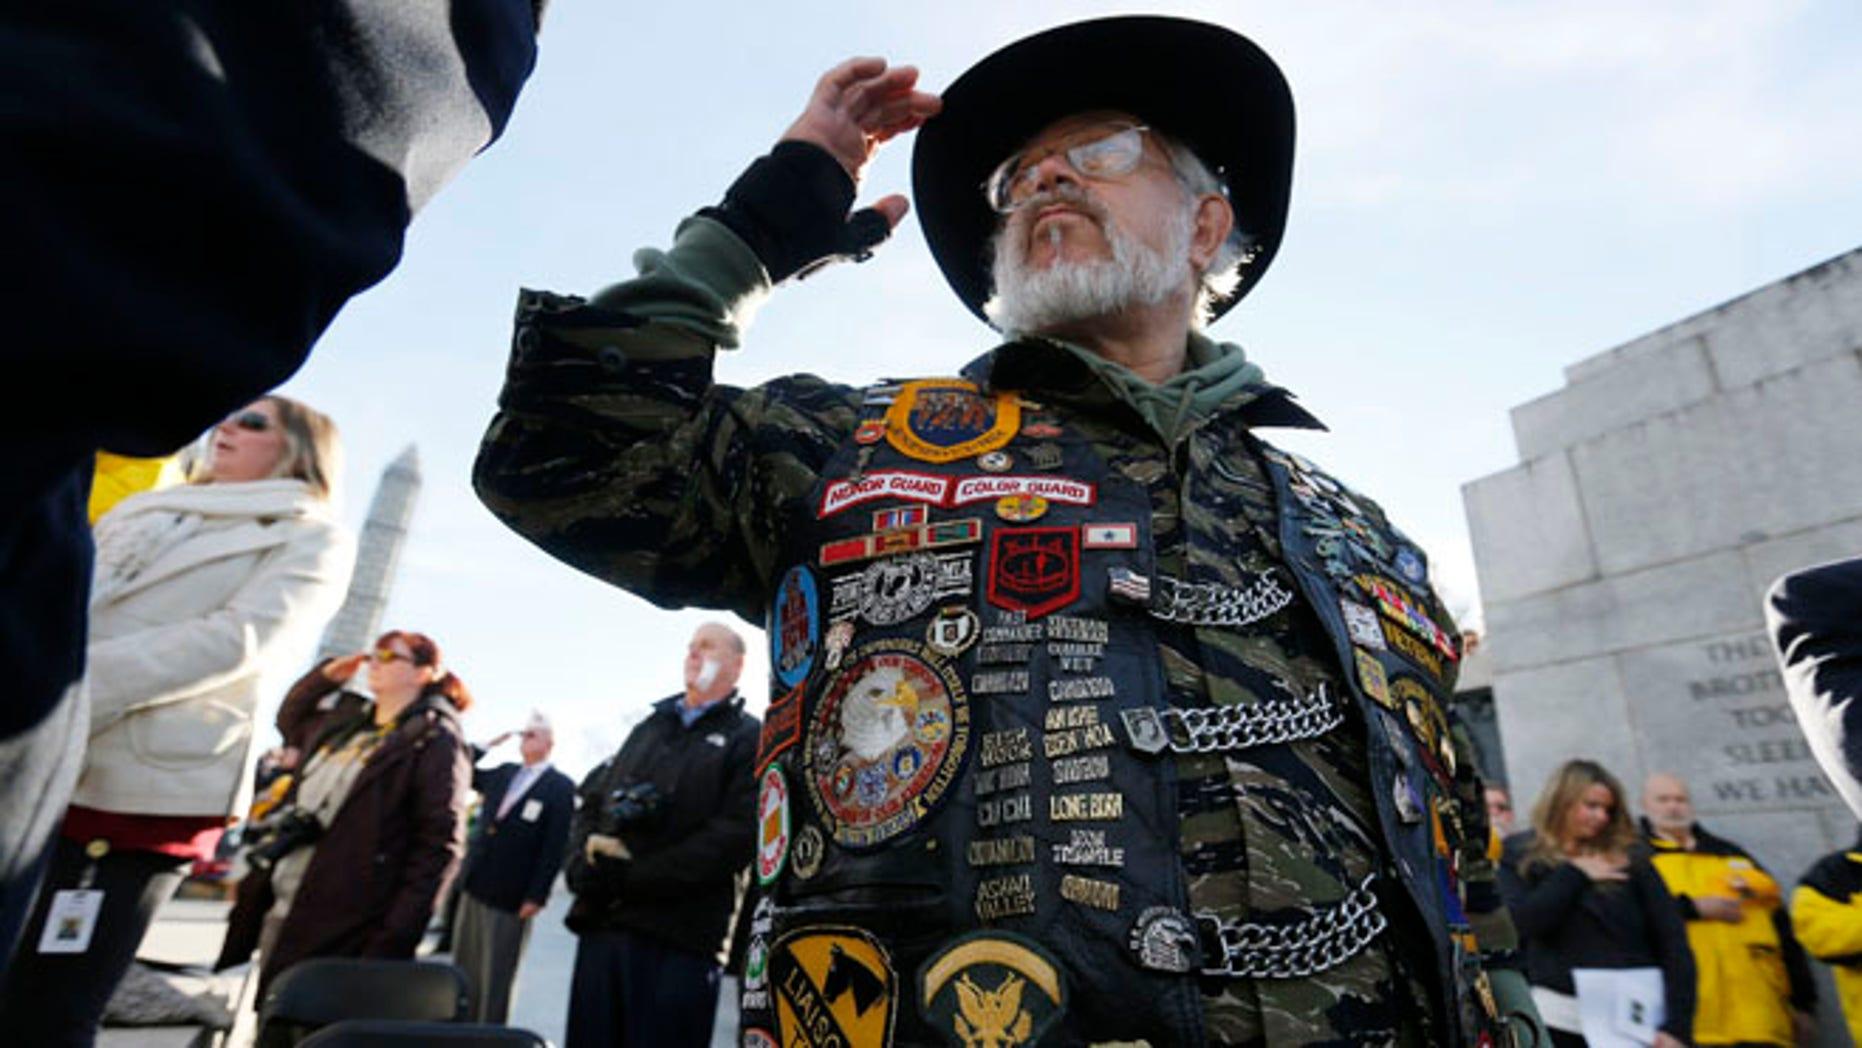 Vietnam veteran Paul Troop, honors his fallen comrades while at the World War II Memorial on Veterans Day in Washington, Nov. 11, 2013.